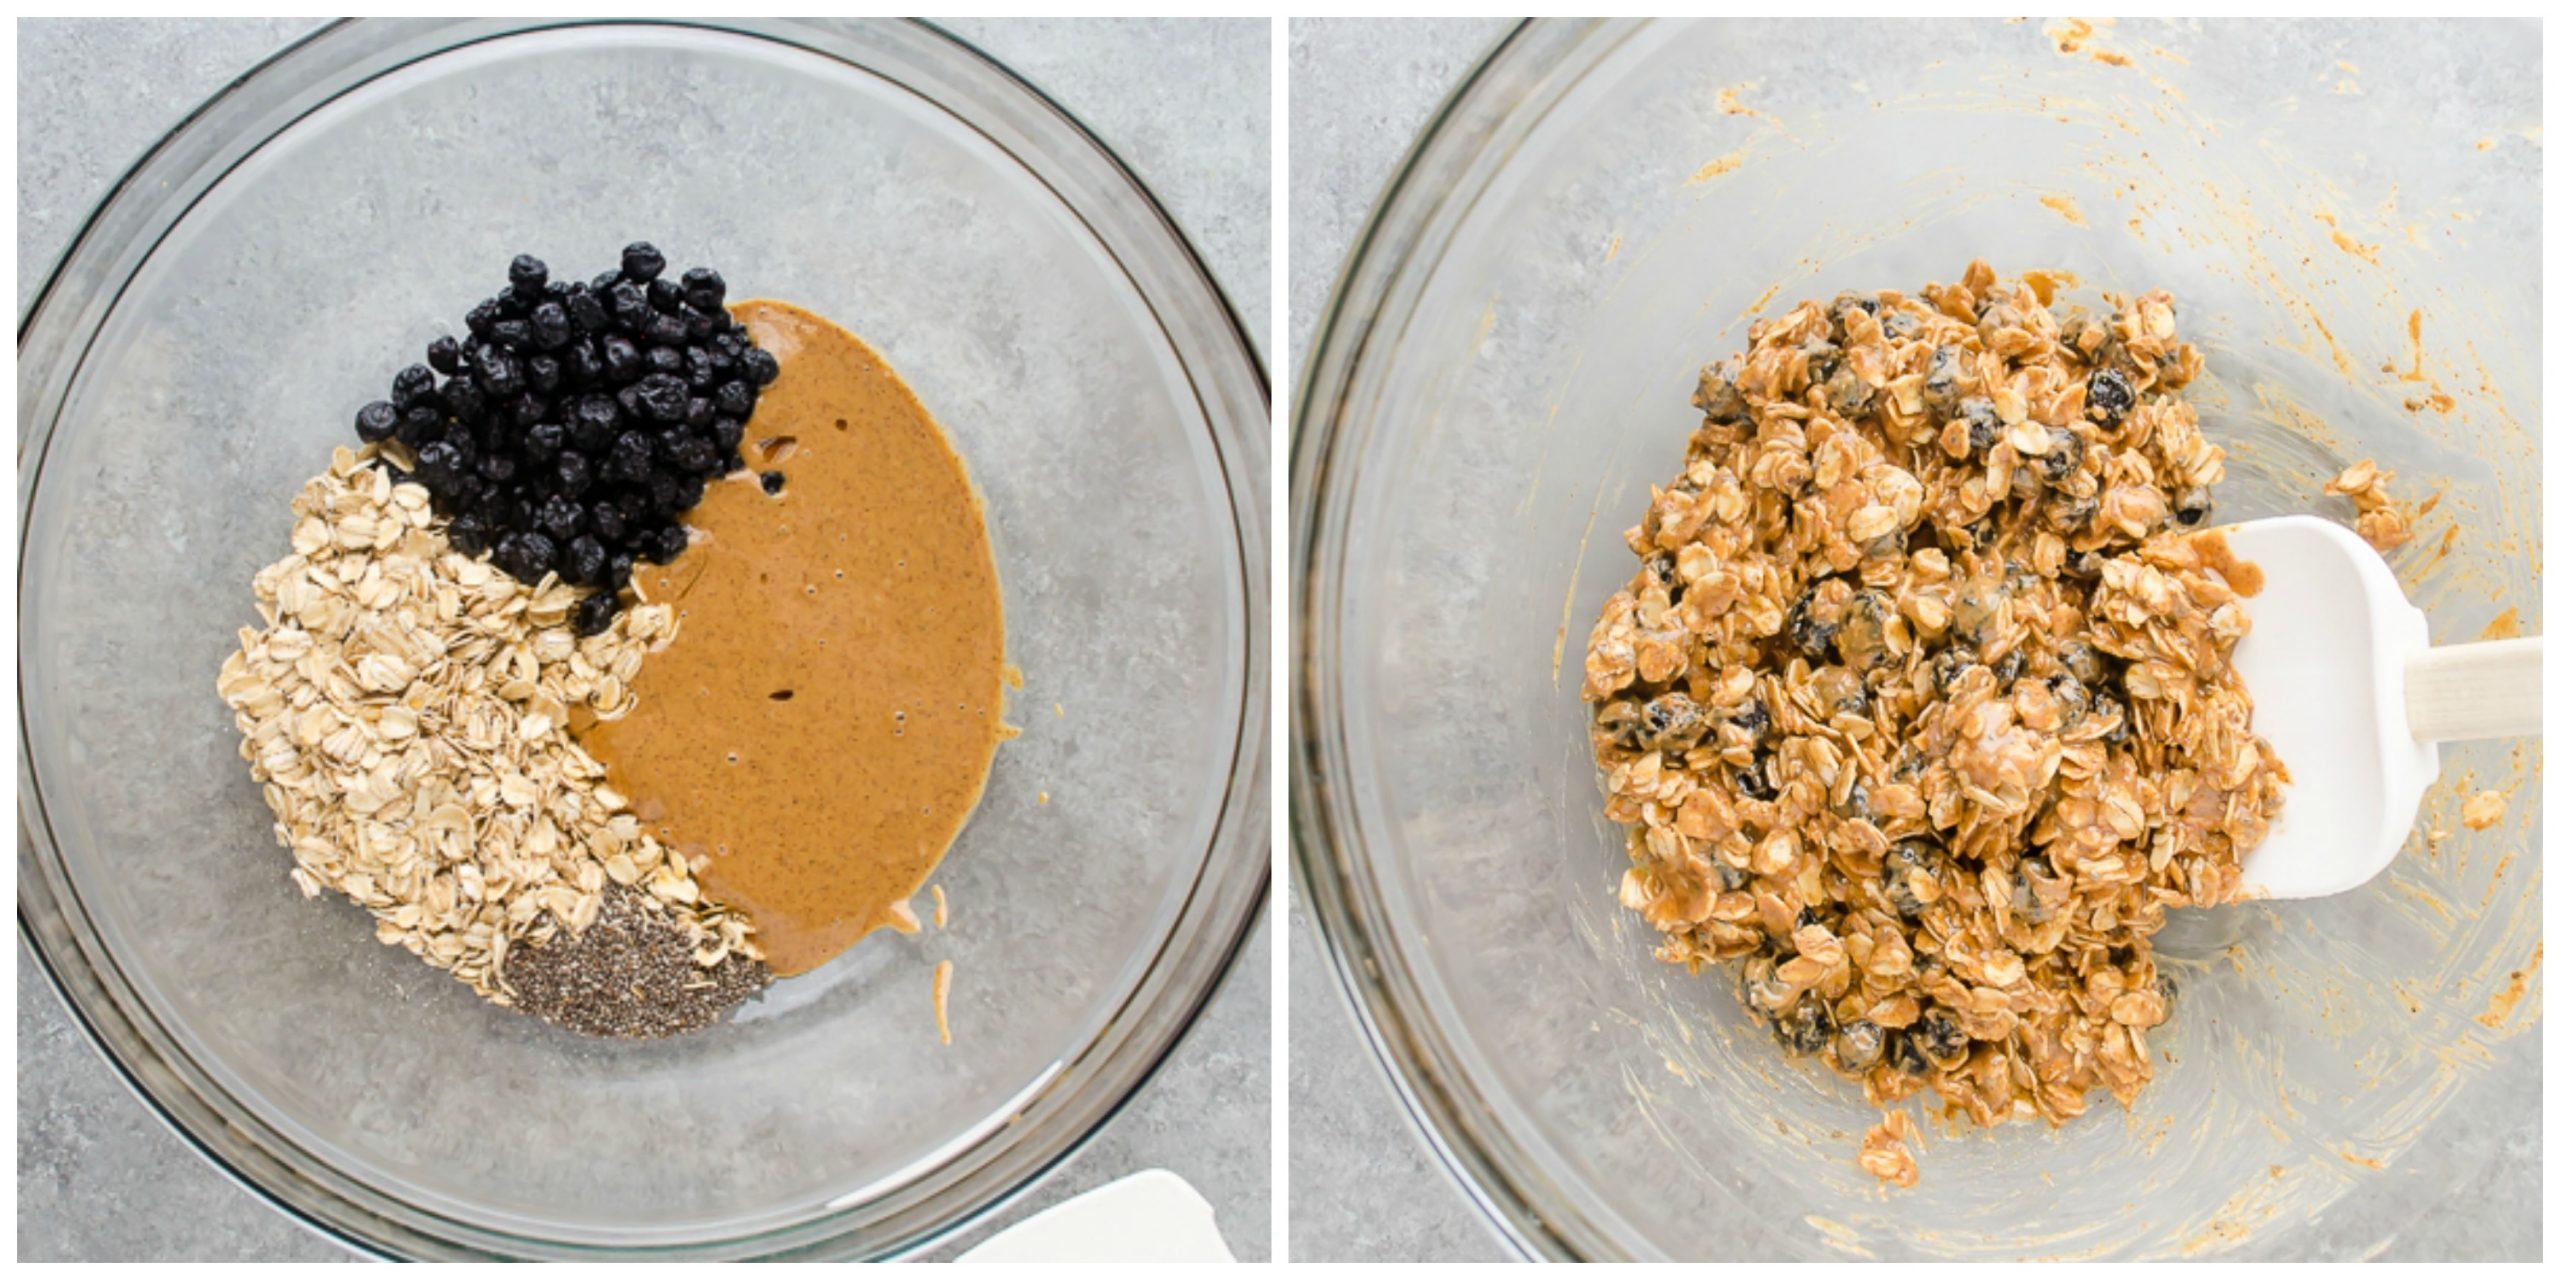 blueberry-almond-chia-energy-bites-process-collage